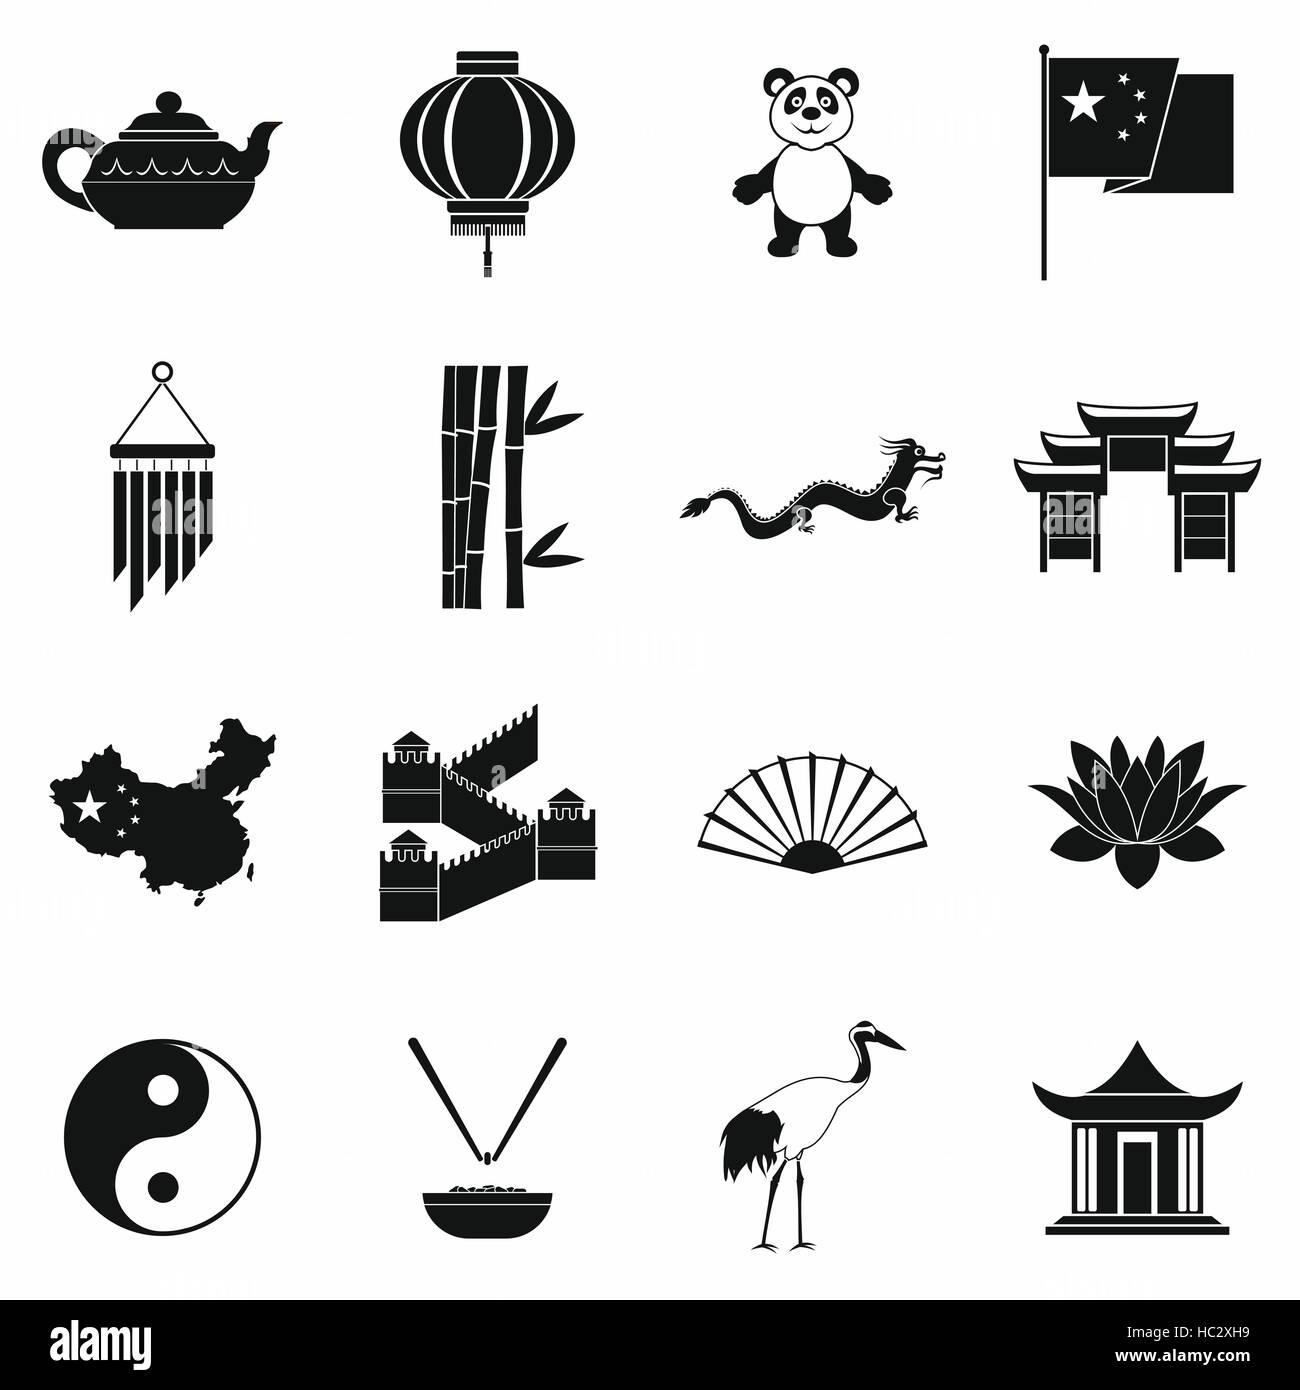 China black simple icons - Stock Image